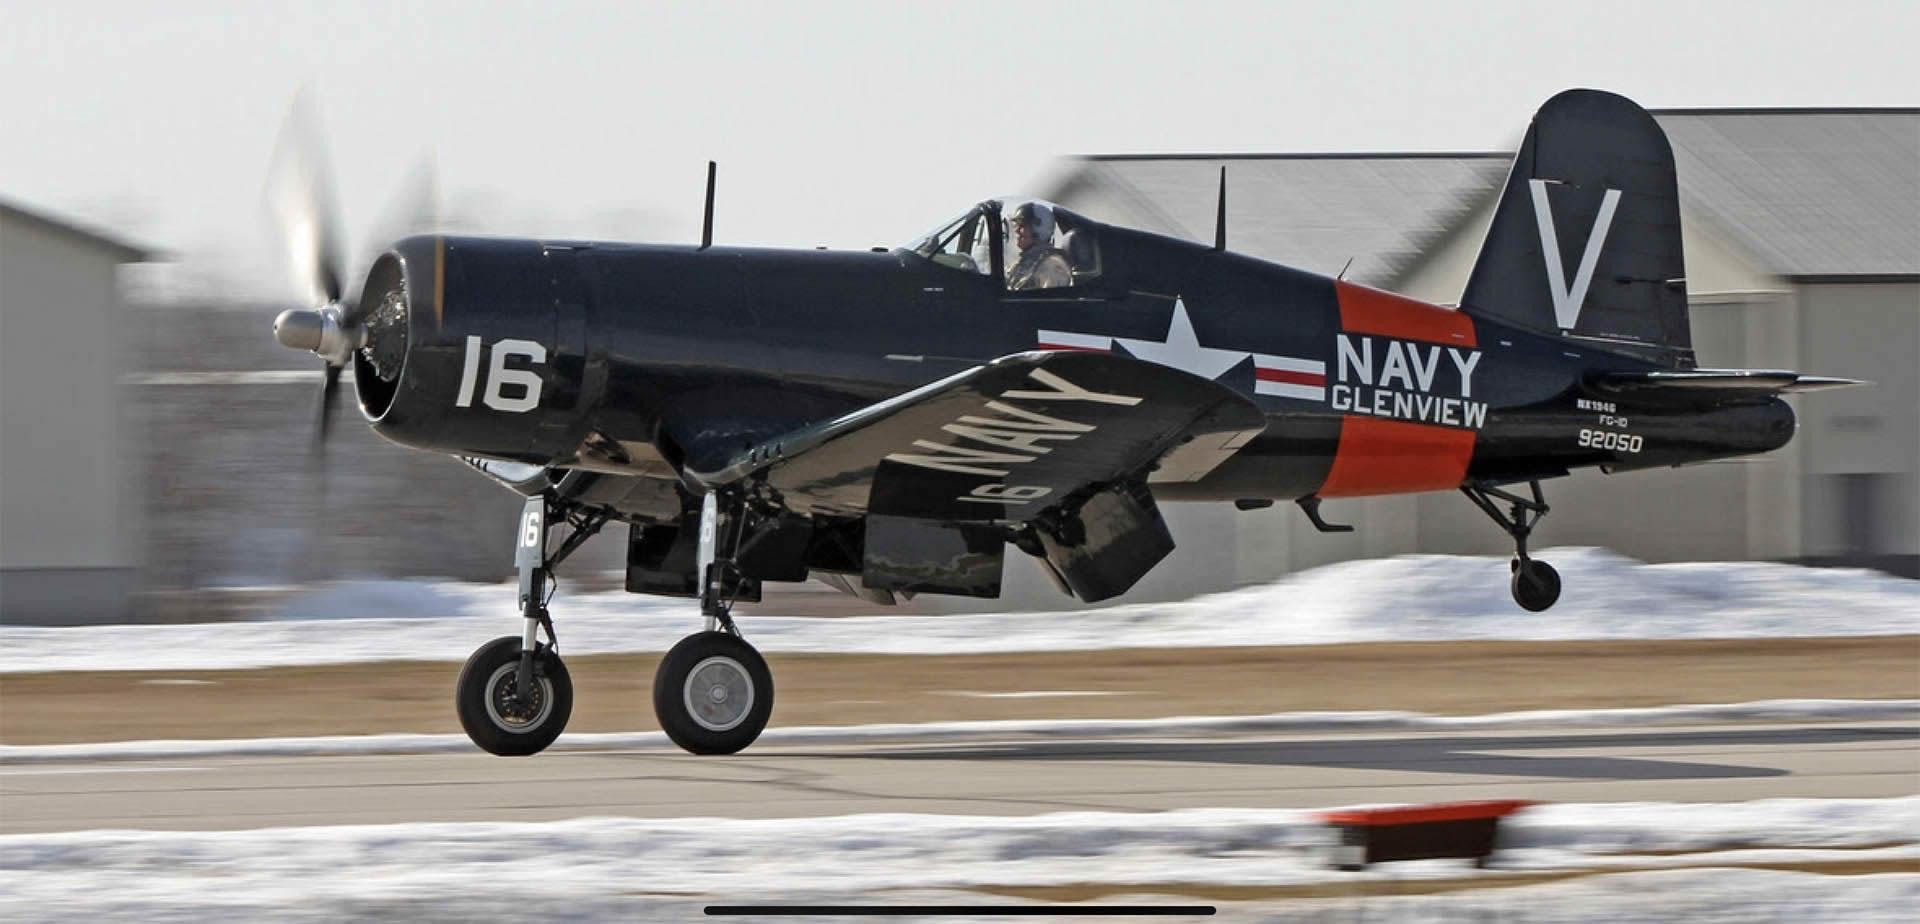 Goodyear FG-1D Bu 92050 ( Photo © Chris Wawro c/o Warbird Heritage Foundation )